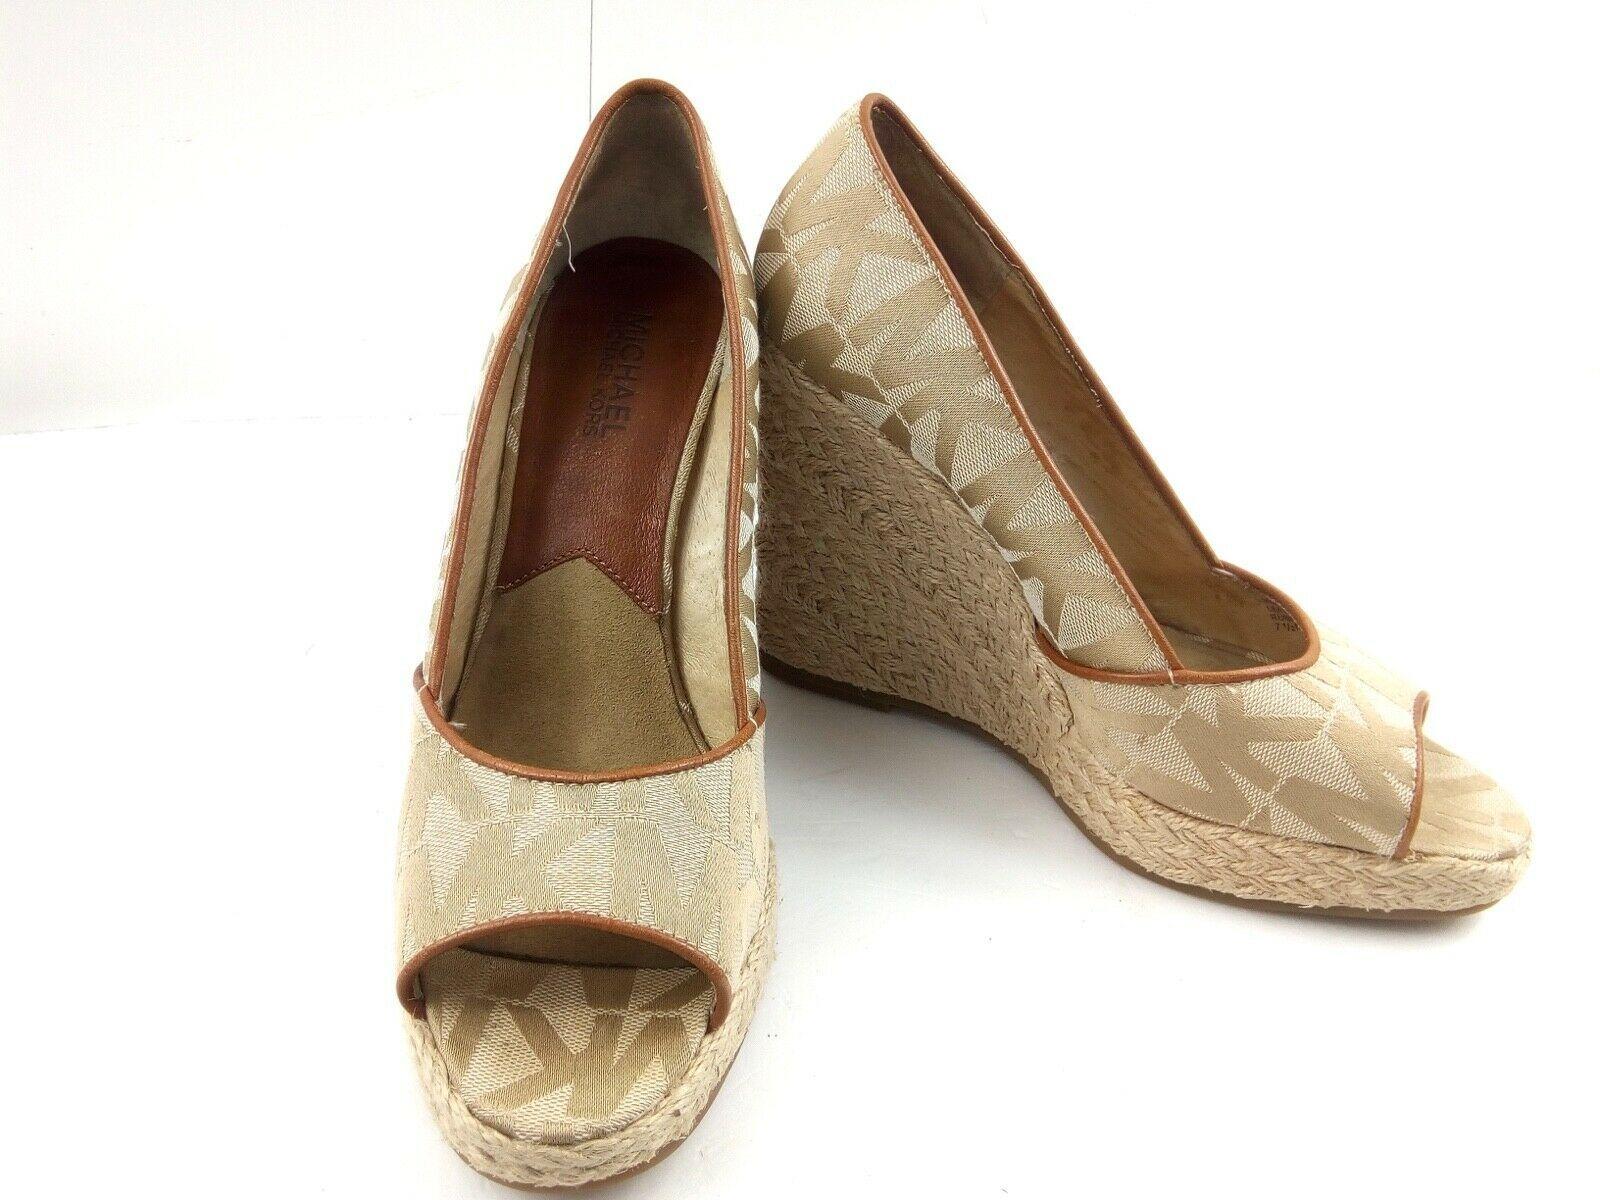 MICHAEL KORS Womens Wedges 7.5 Tan Cabana Peep Toe Platform Espadrilles $144